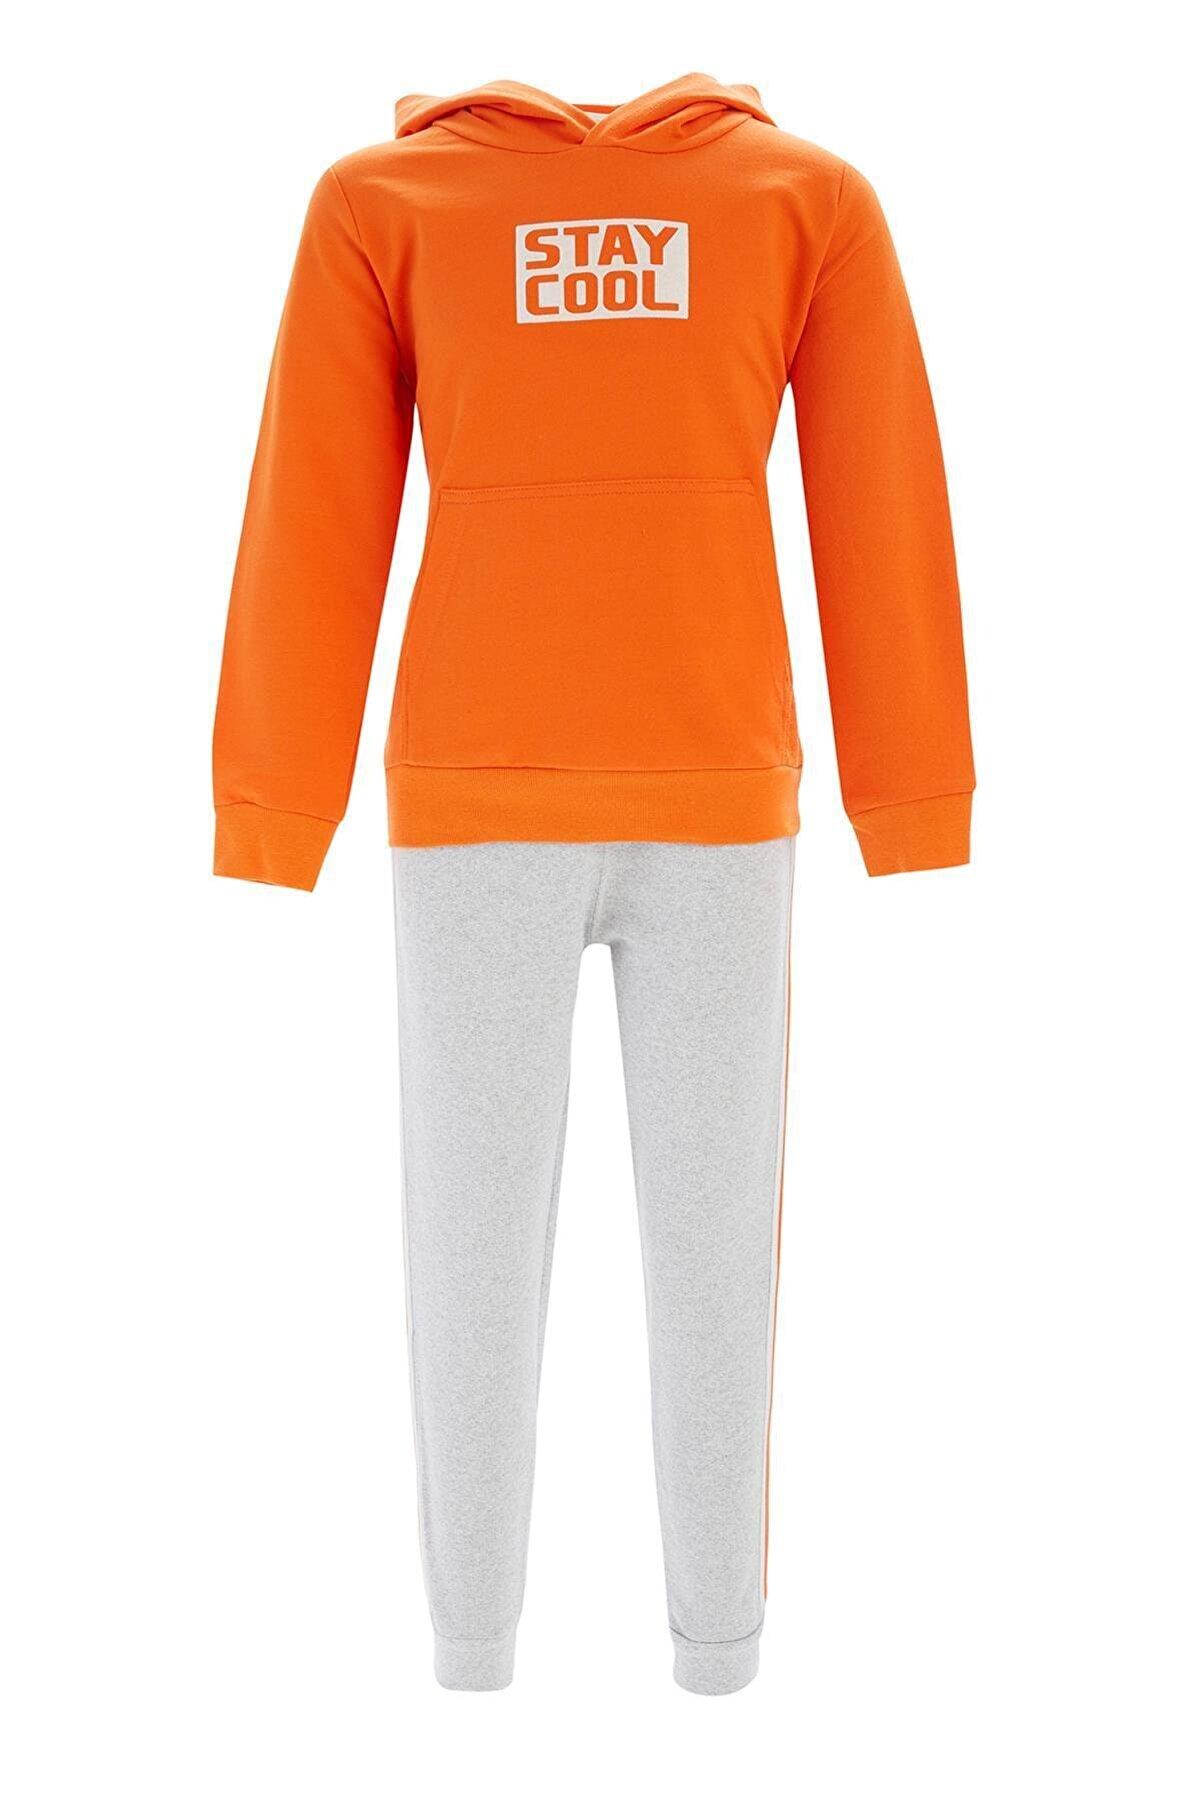 Defacto Erkek Çocuk Kapüşonlu Sweatshirt Ve Jogger Eşofman Takım S2884A620WN